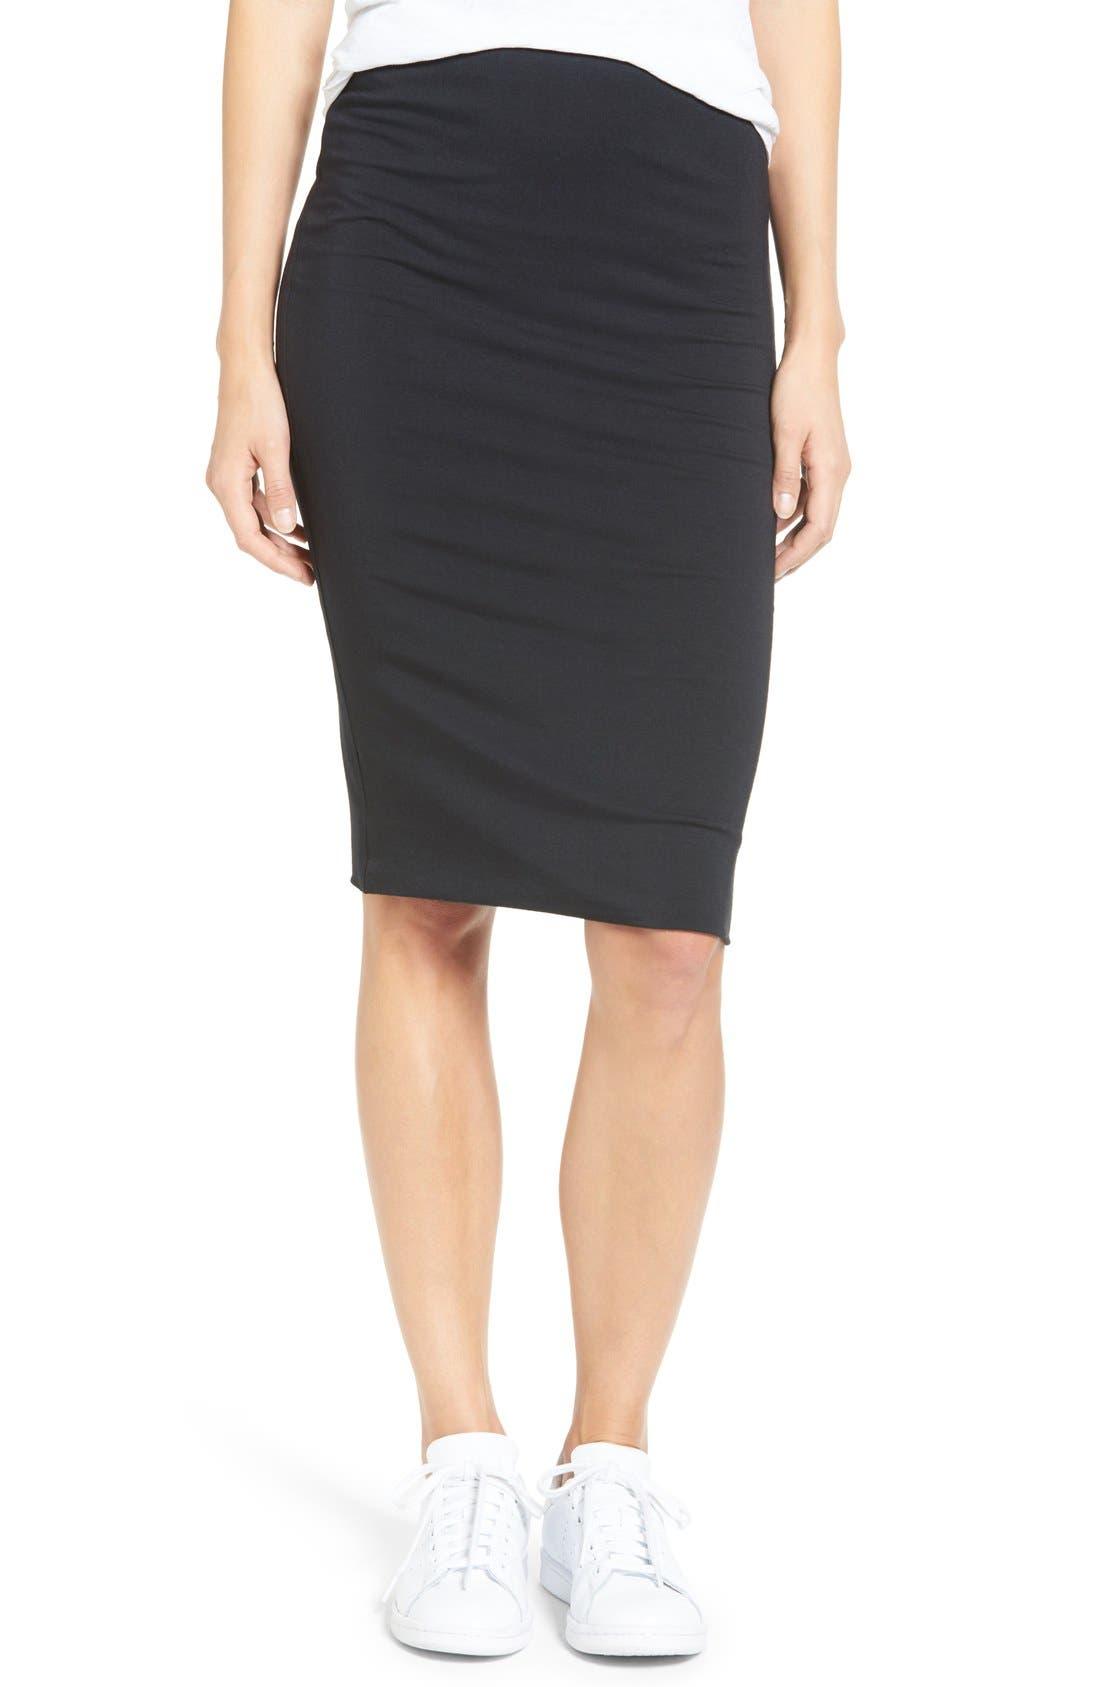 Main Image - Amour Vert 'Yuma' Stretch Knit Skirt